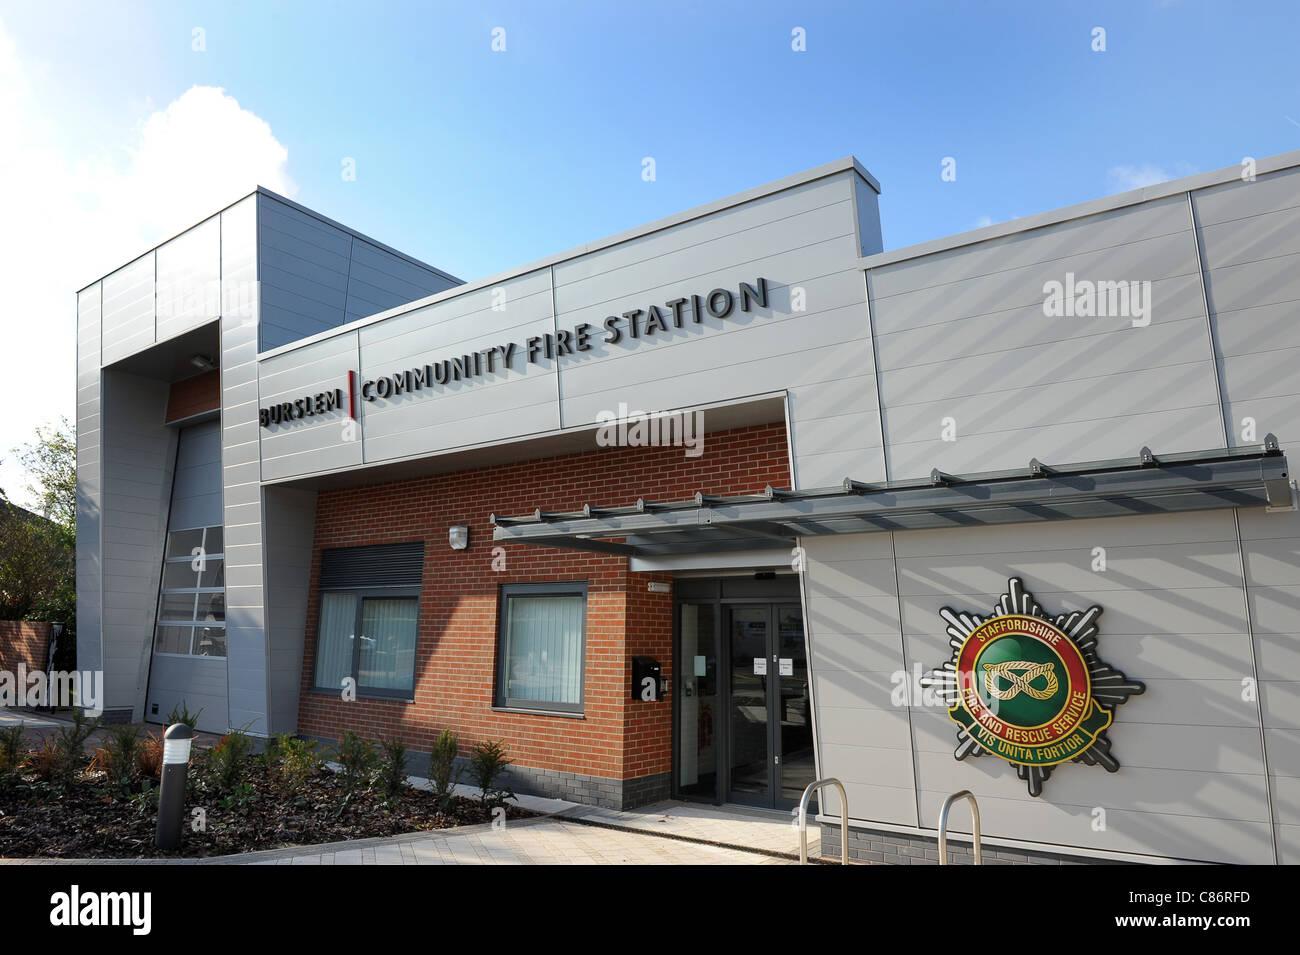 Staffordshire Fire and Rescue Service Burslem Community Fire station Stoke on Trent England Uk - Stock Image